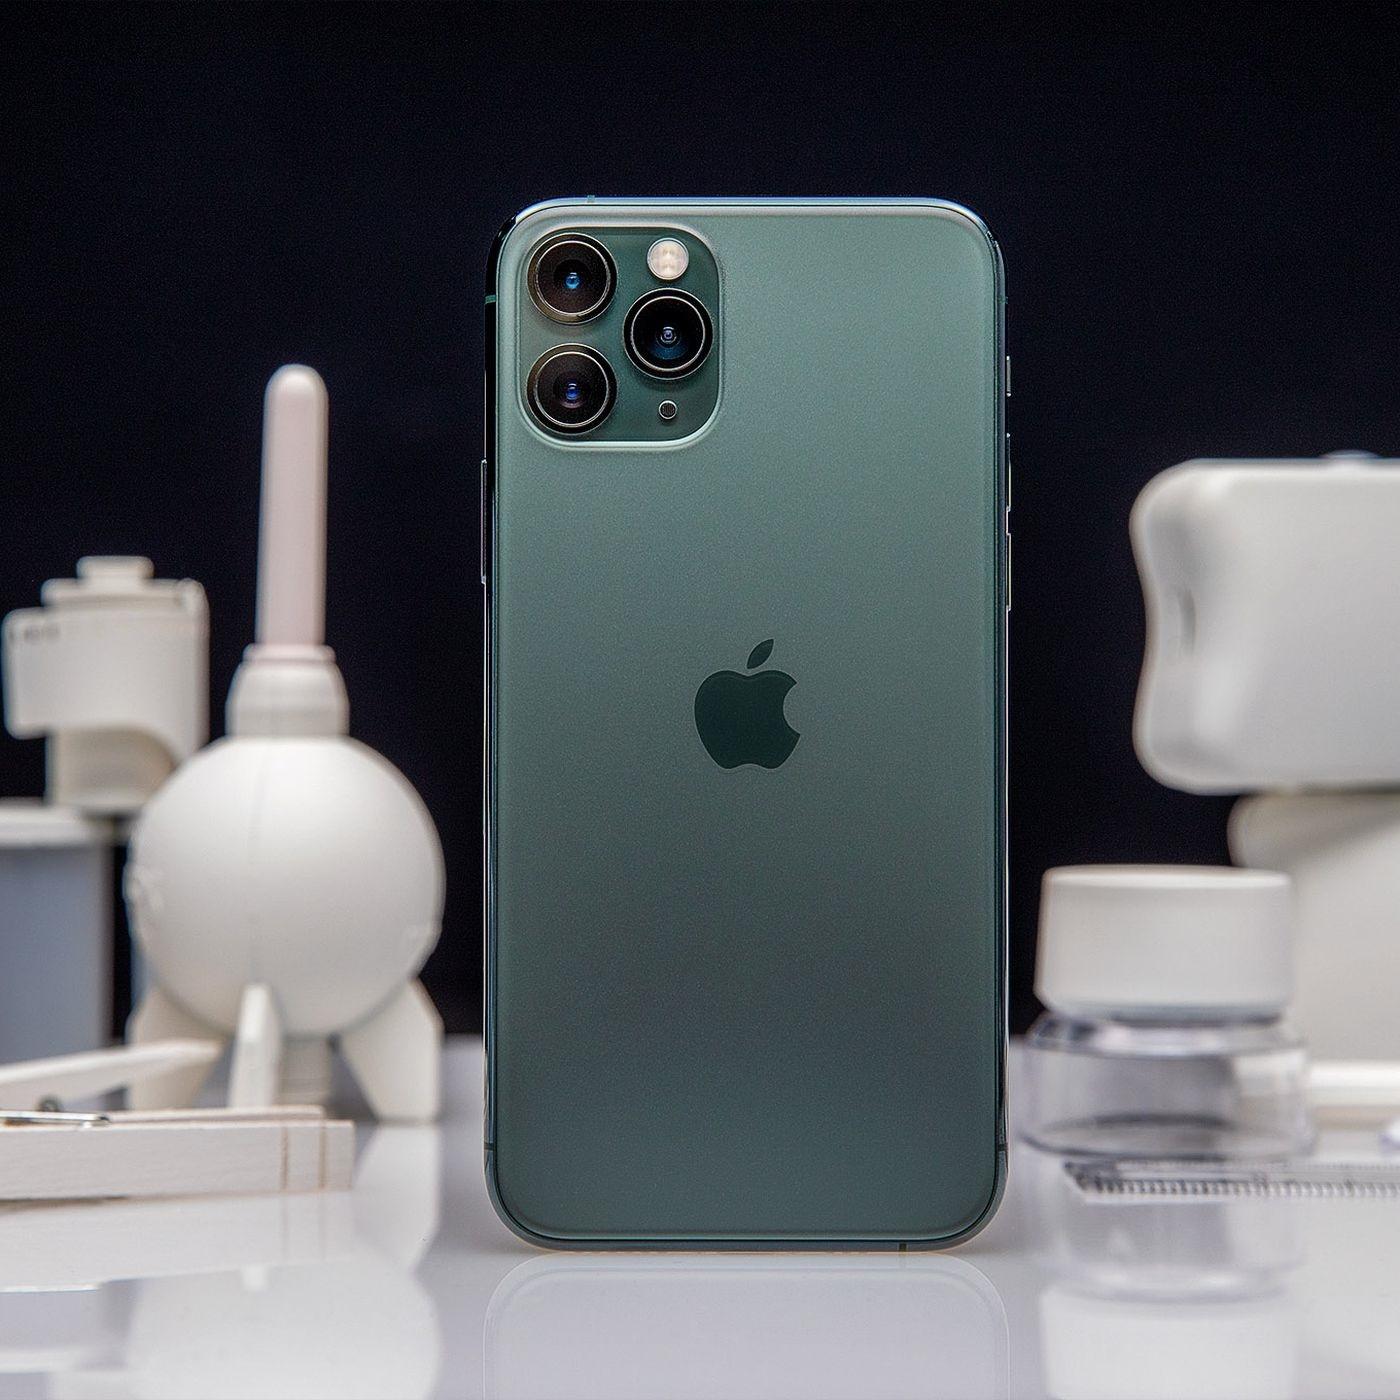 تصاویر آیفون 11 پرو مکس - iphone 11 pro max